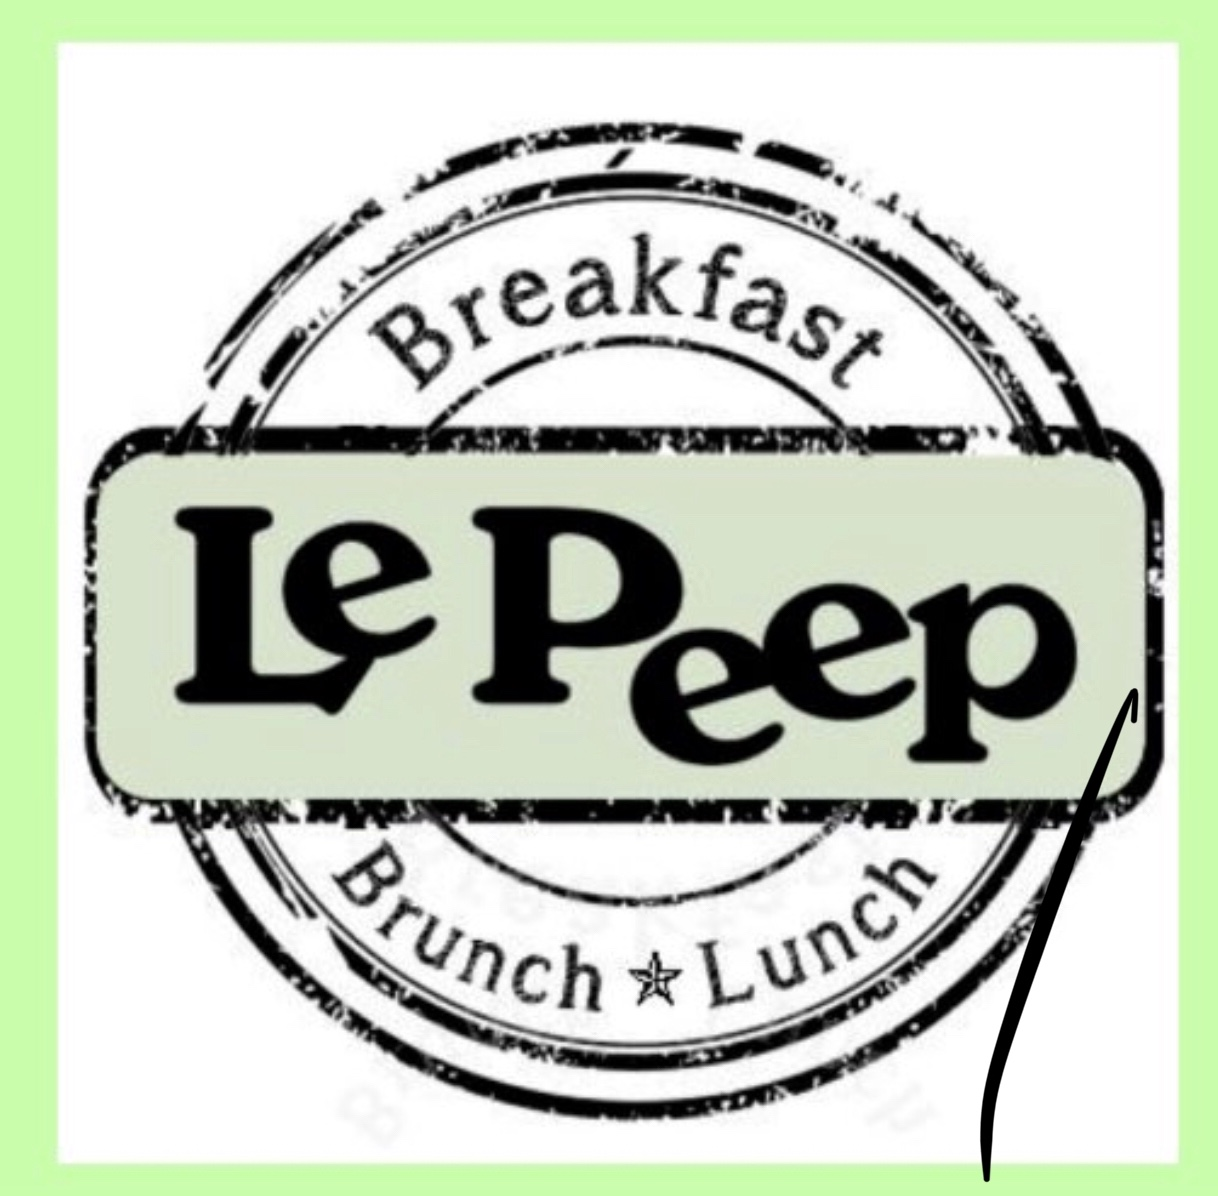 Sponsor Le Peep